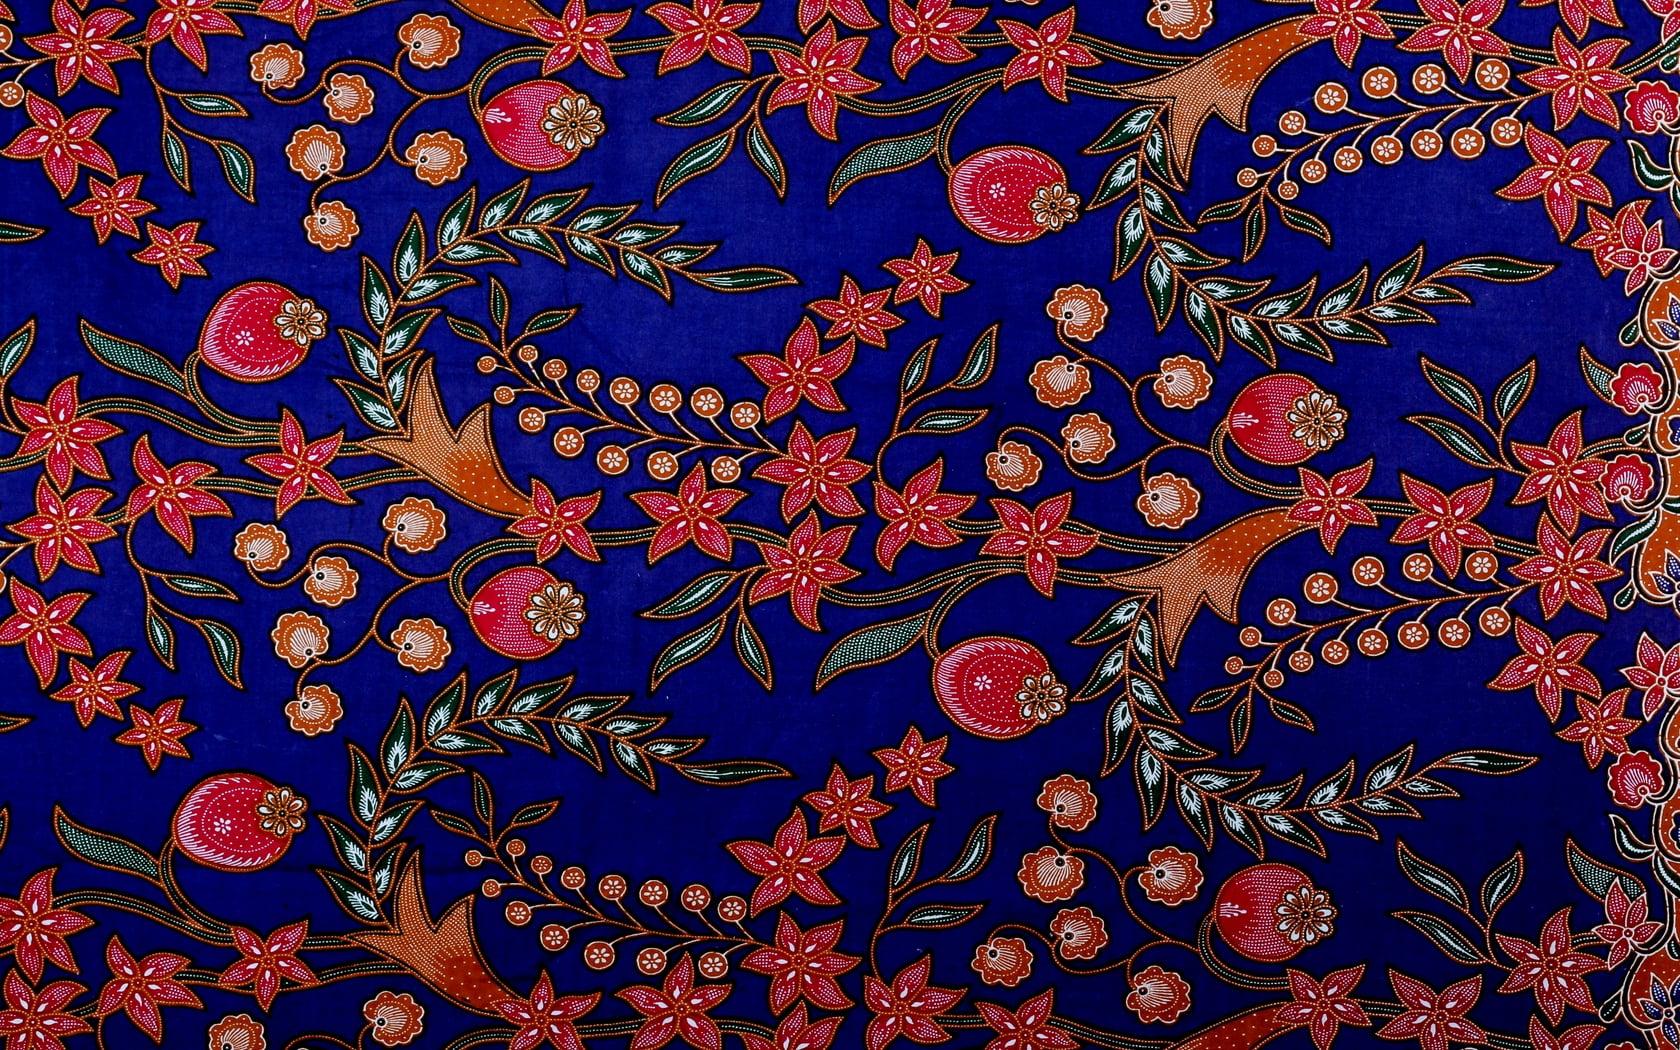 Fabric Of Malaysia Batik   20x20 Wallpaper   teahub.io